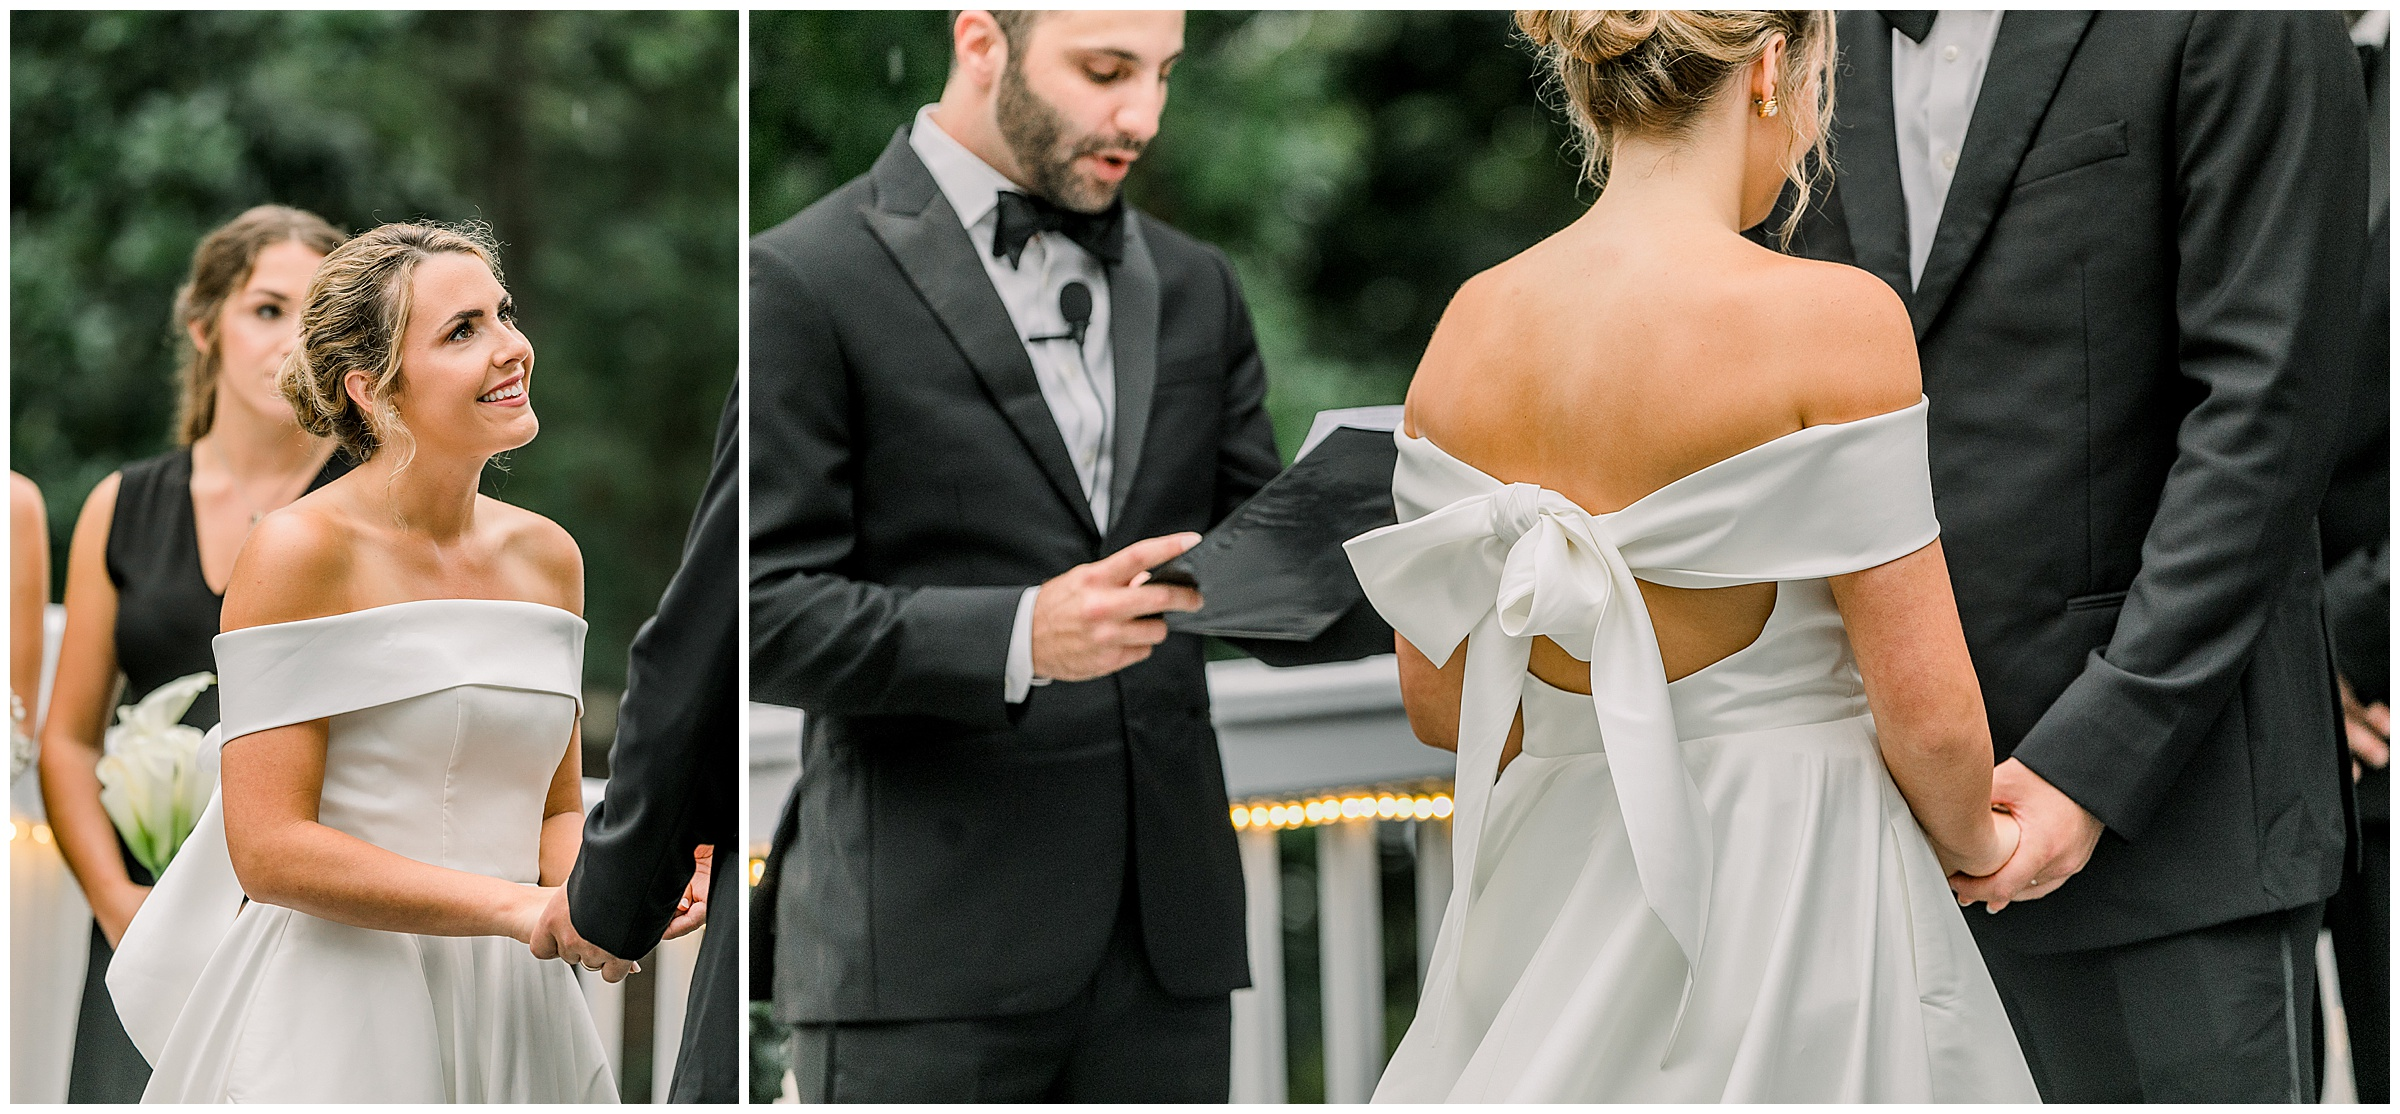 KIP EDGEMON WEDDING MACKEY HOUSE 15.jpg